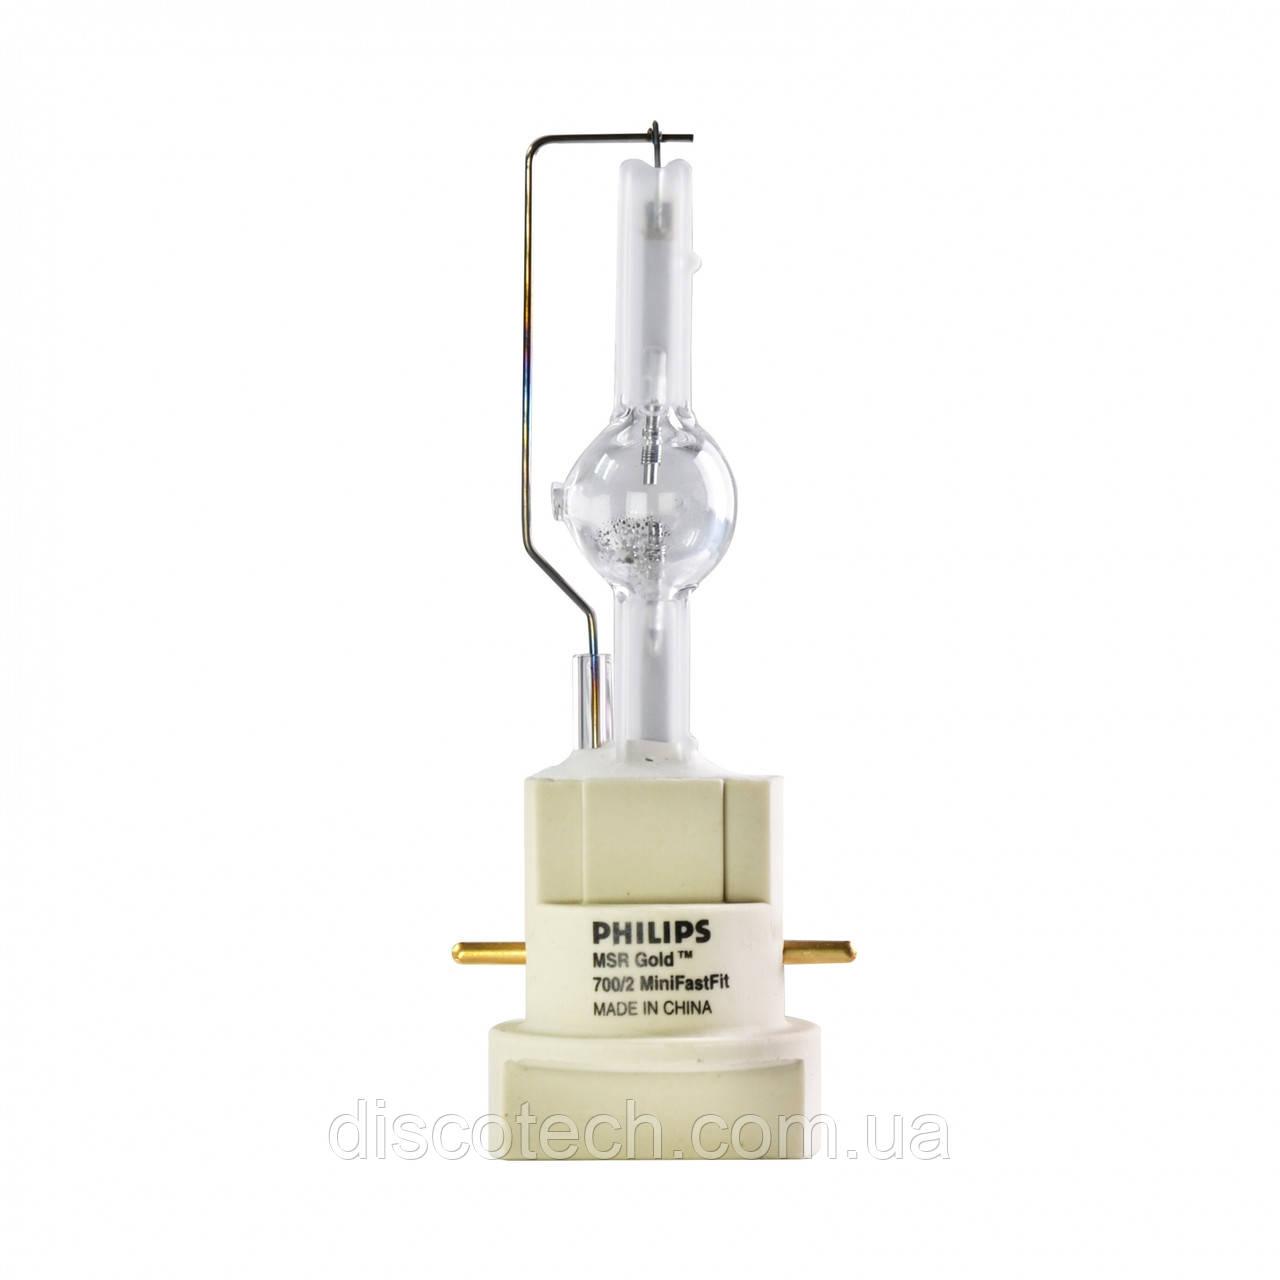 Лампа PHILIPS MSR Gold 700/2 MiniFastFit PGJx28 7200K 750 h